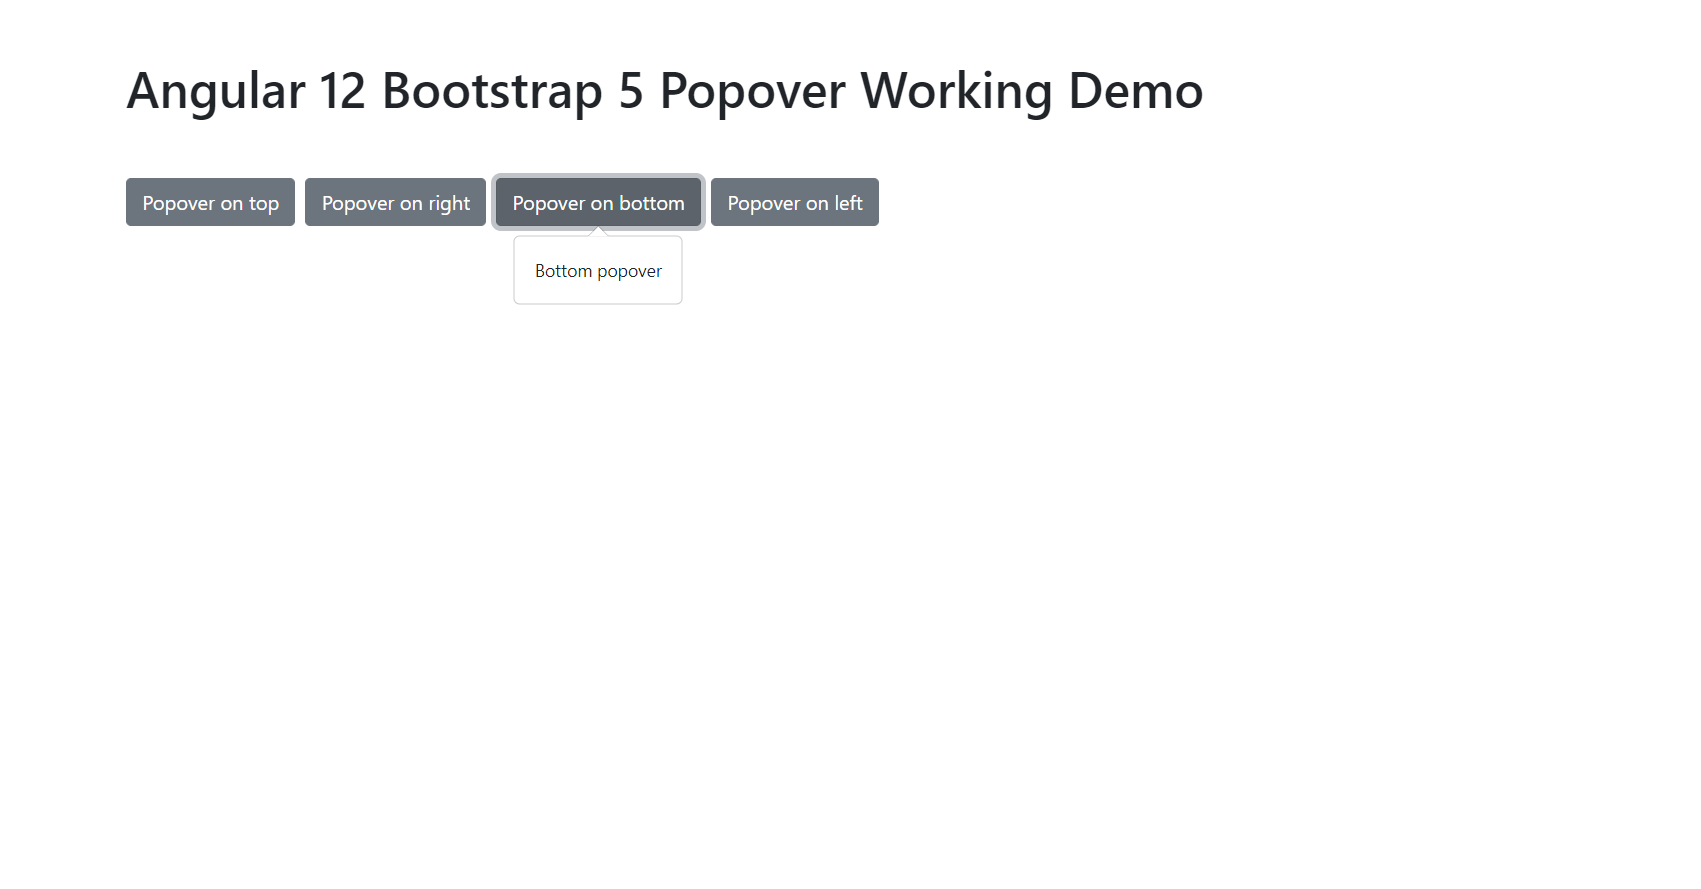 Angular 12 Bootstrap 5 Popover Working Demo